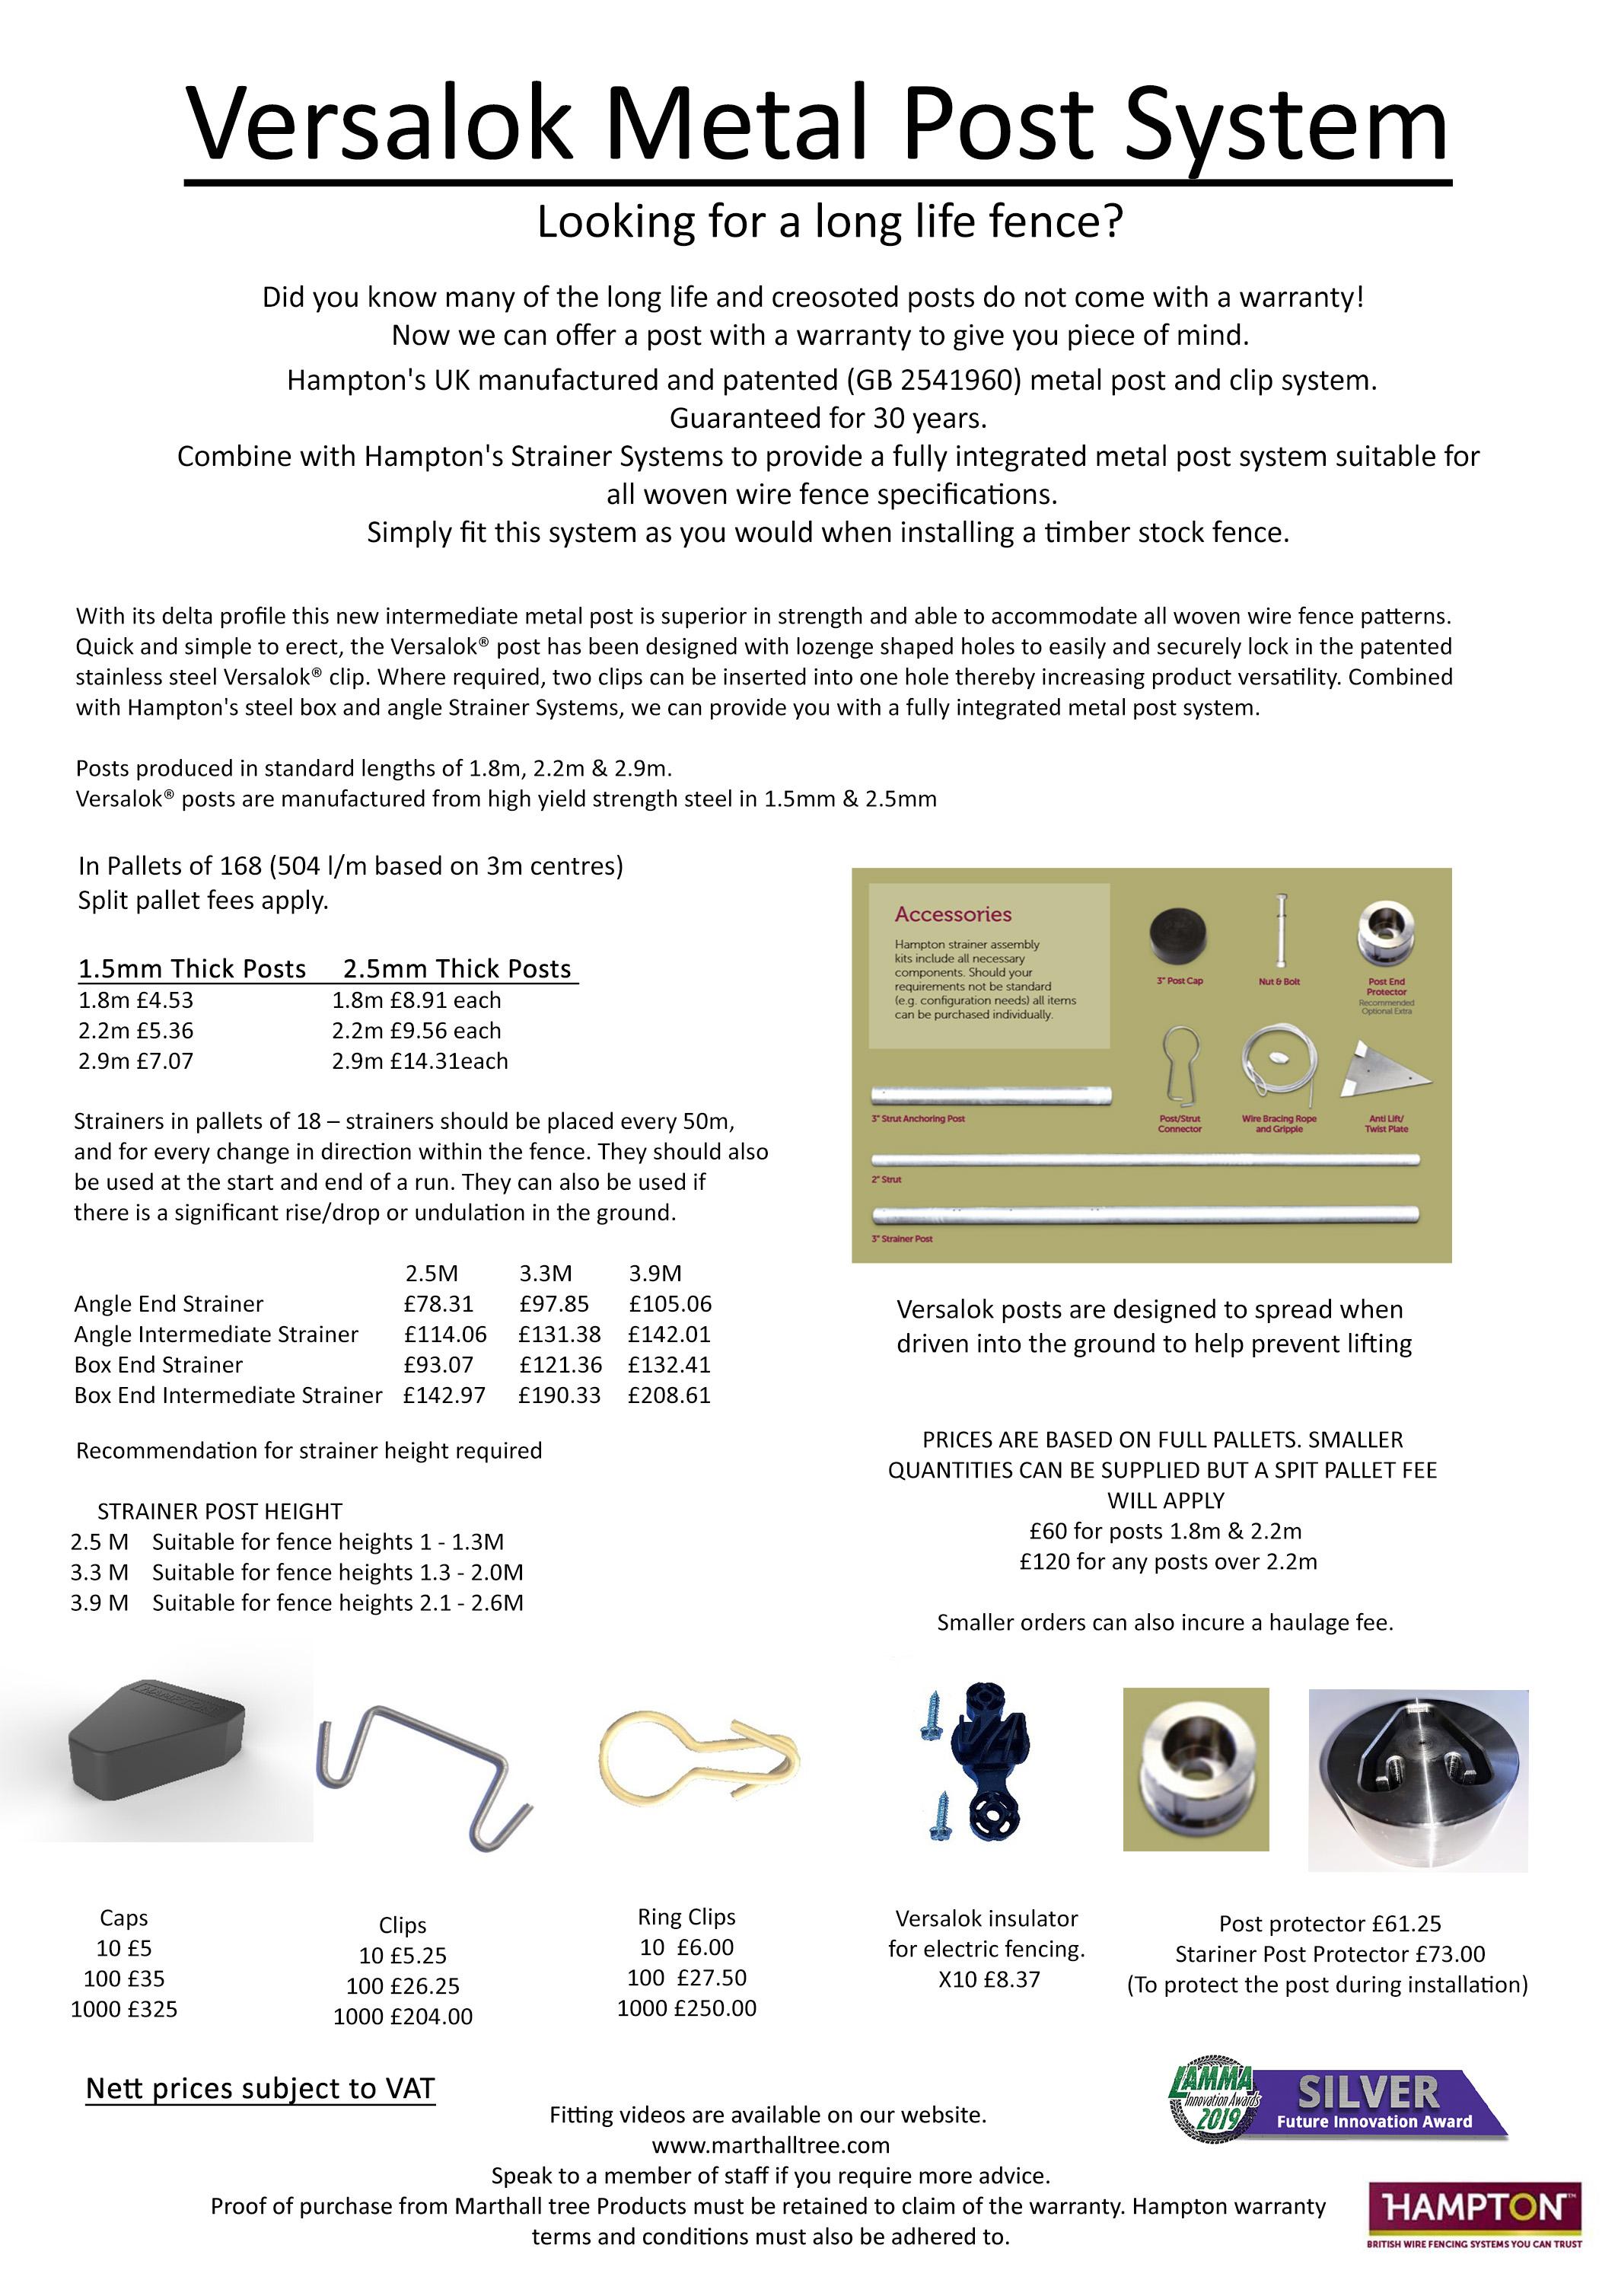 versalok leaflet -corrected prices.jpg